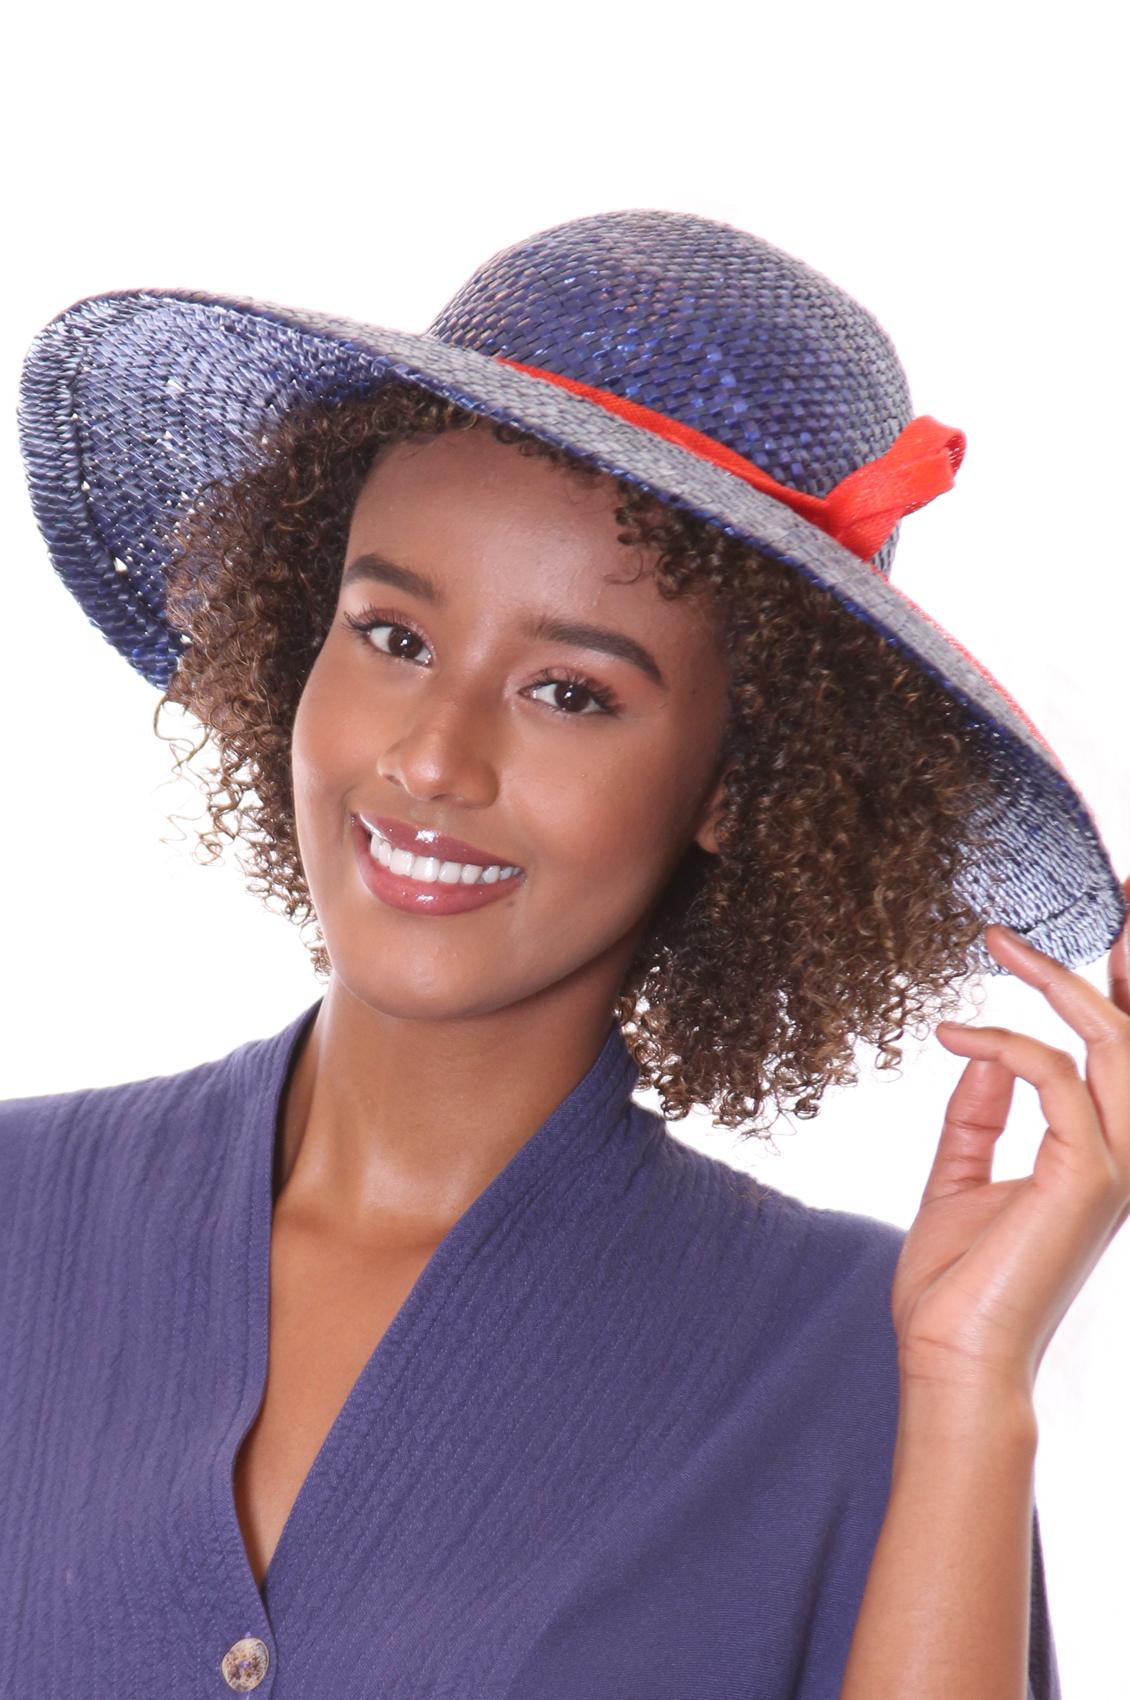 LARGE BRIM STRAW HAT